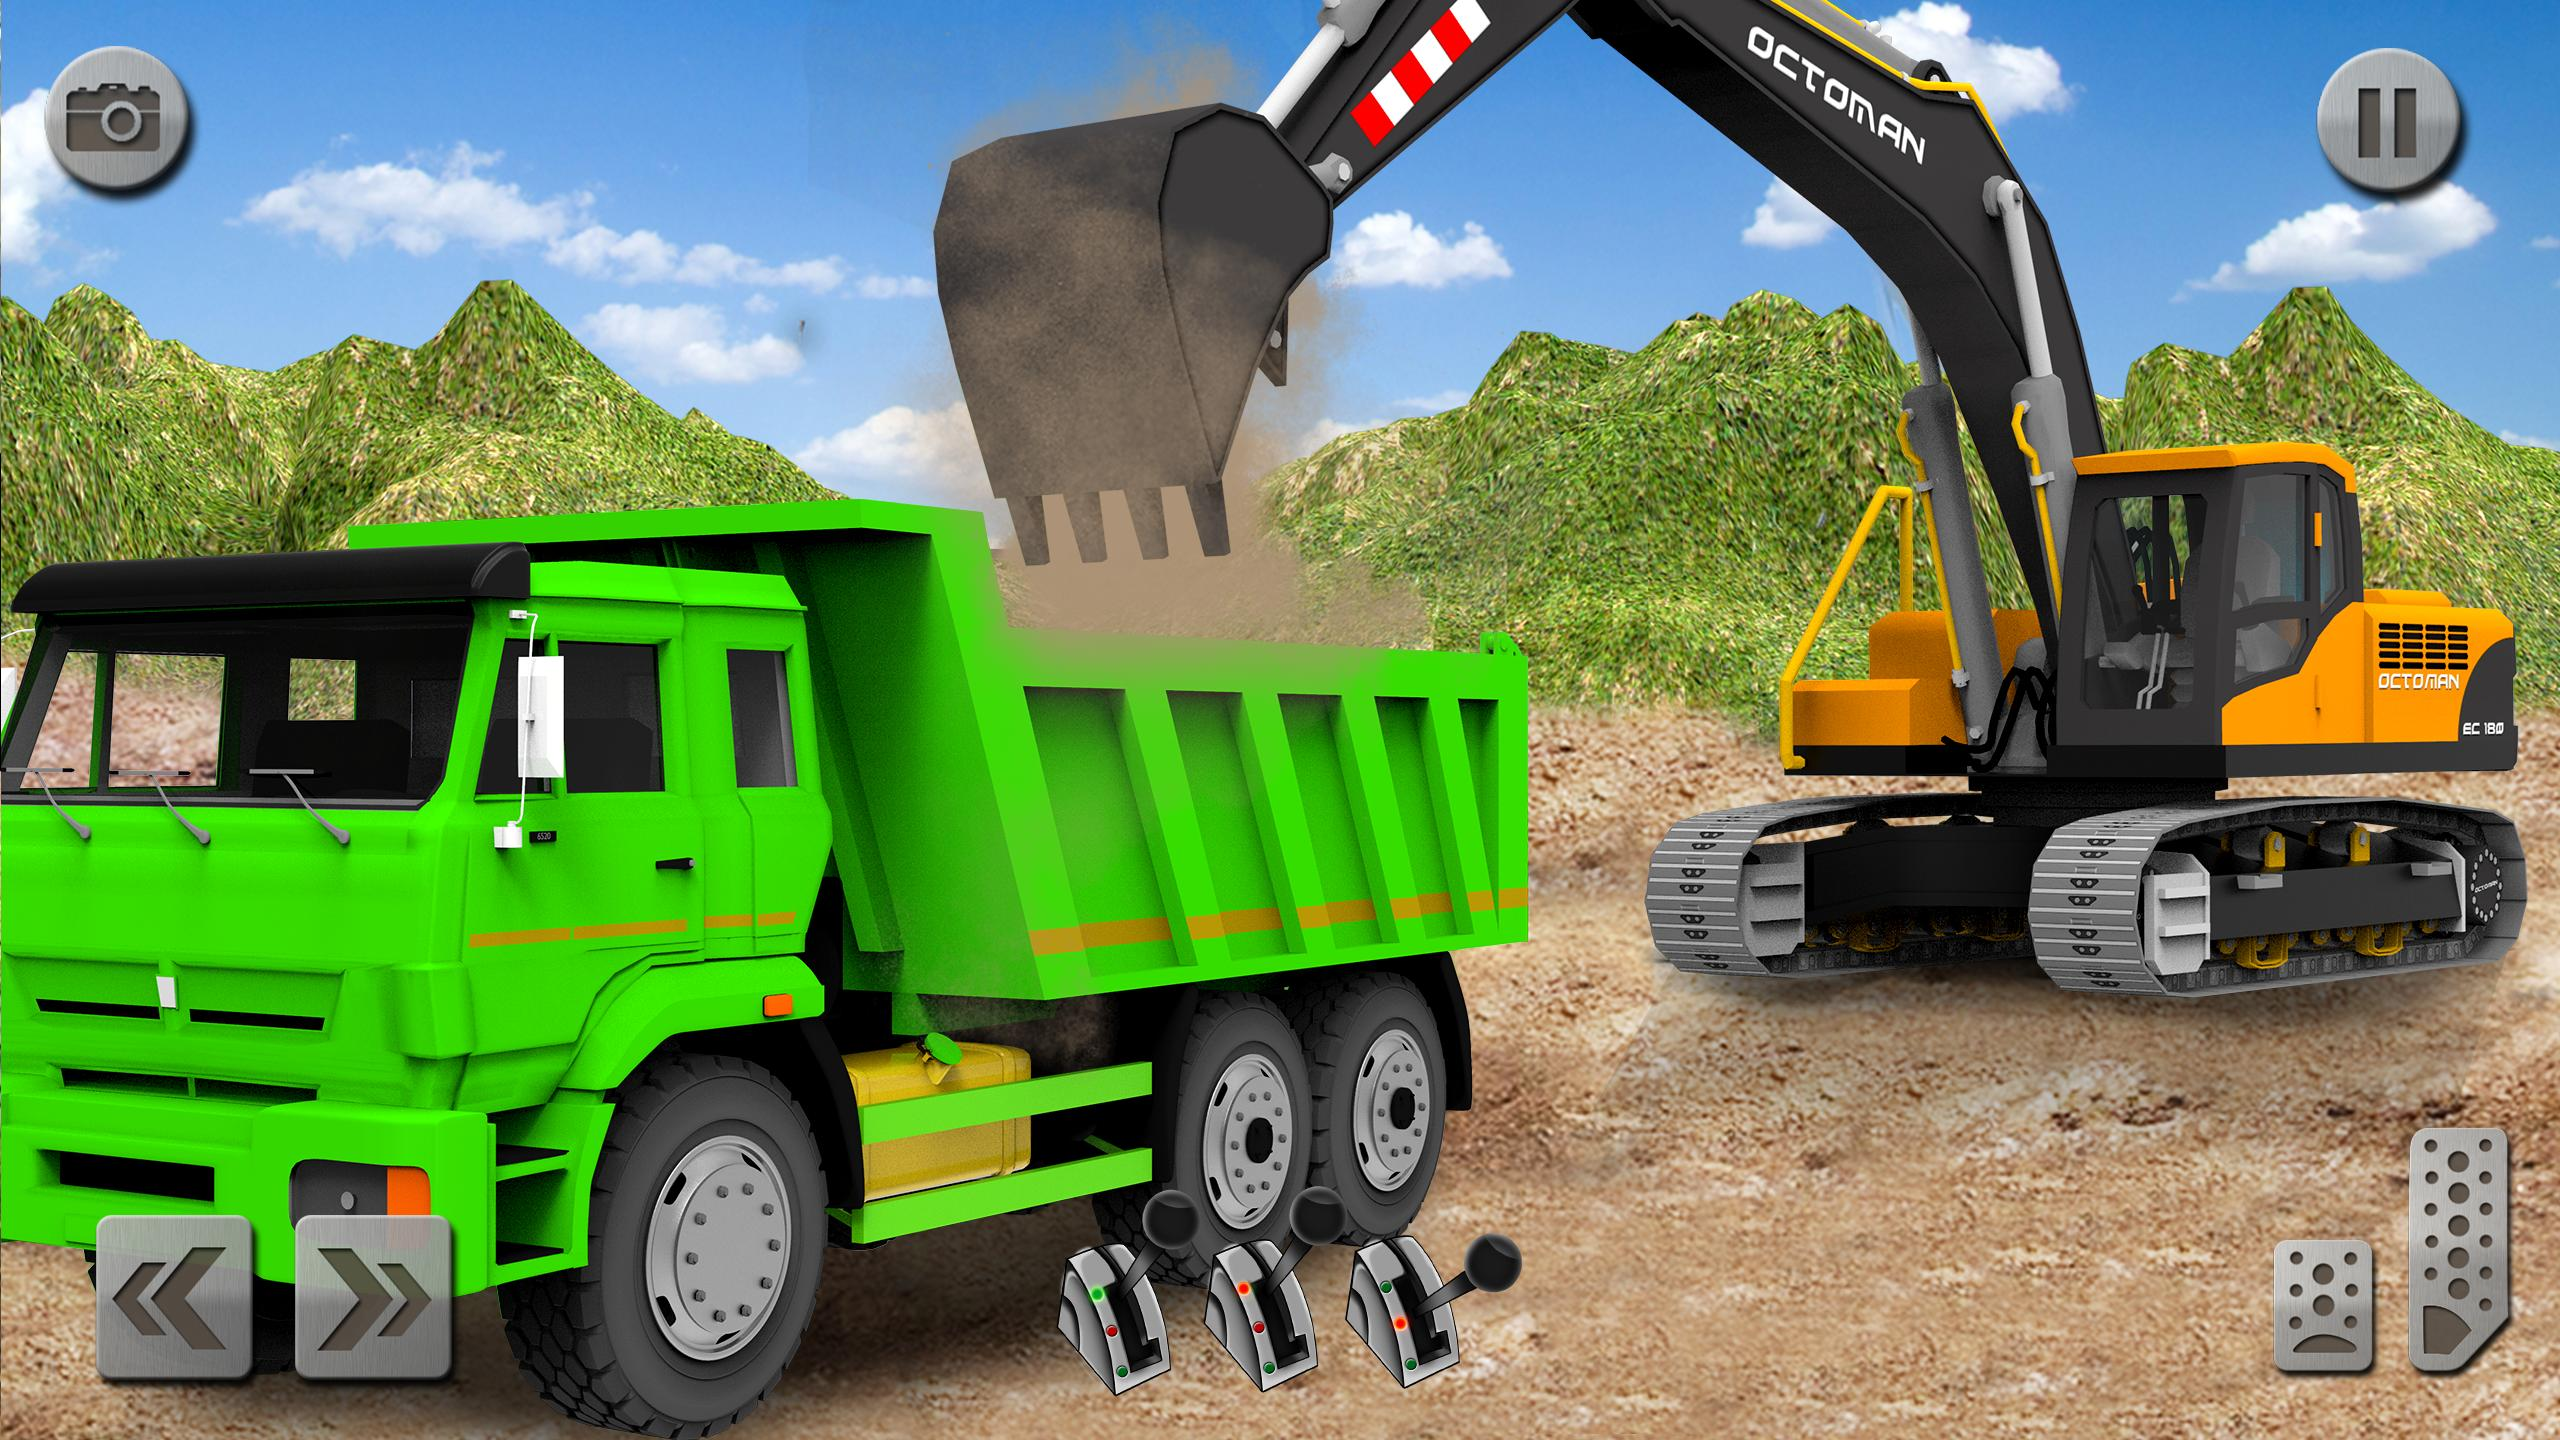 Sand Excavator Truck Driving Rescue Simulator game 5.2 Screenshot 9